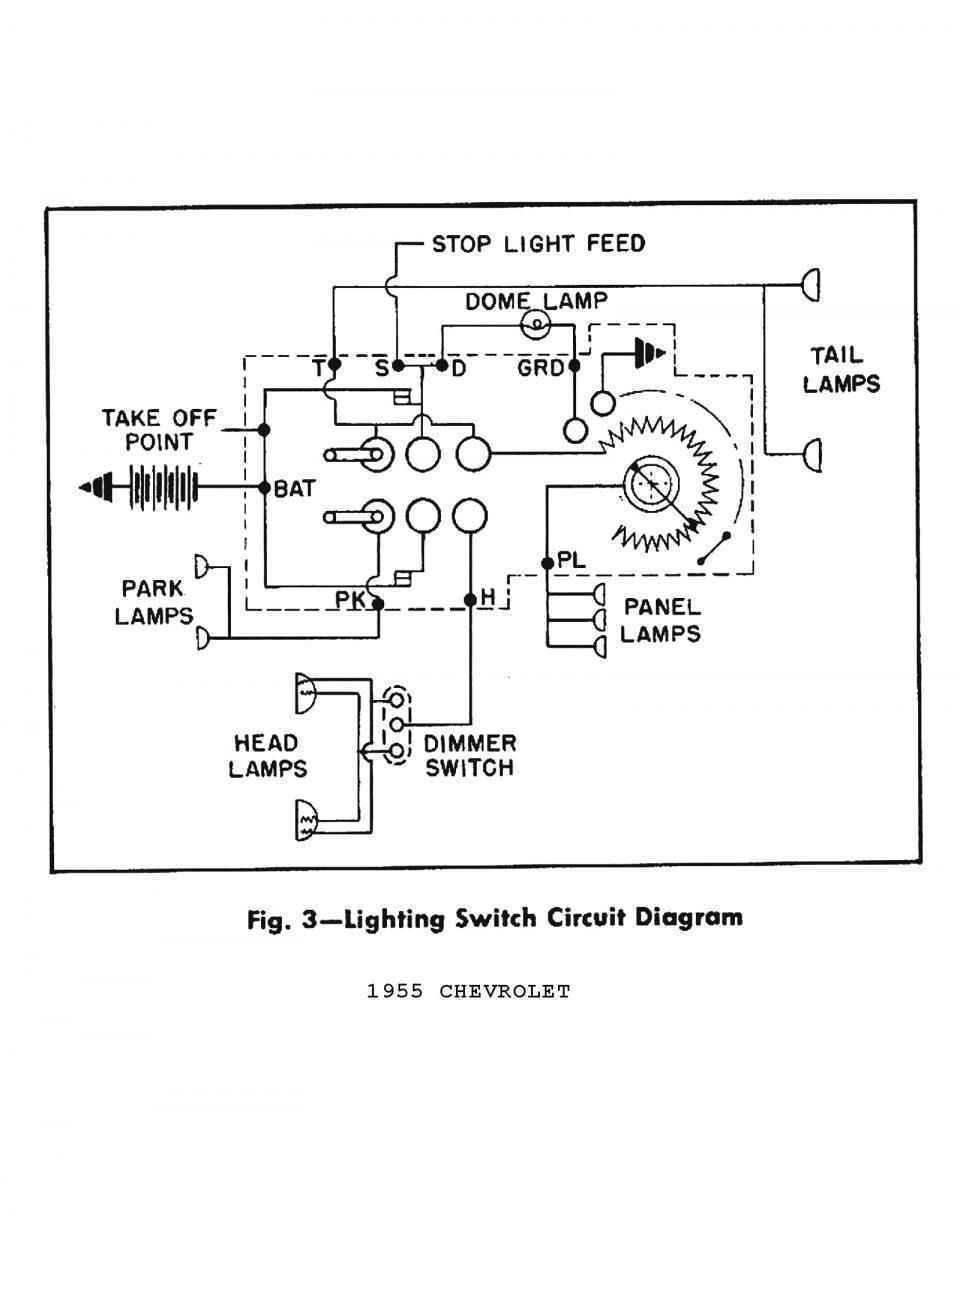 medium resolution of bodine b100 emergency ballast wiring diagram famous bodine b90 wiring diagram inspiration electrical circuit emergency